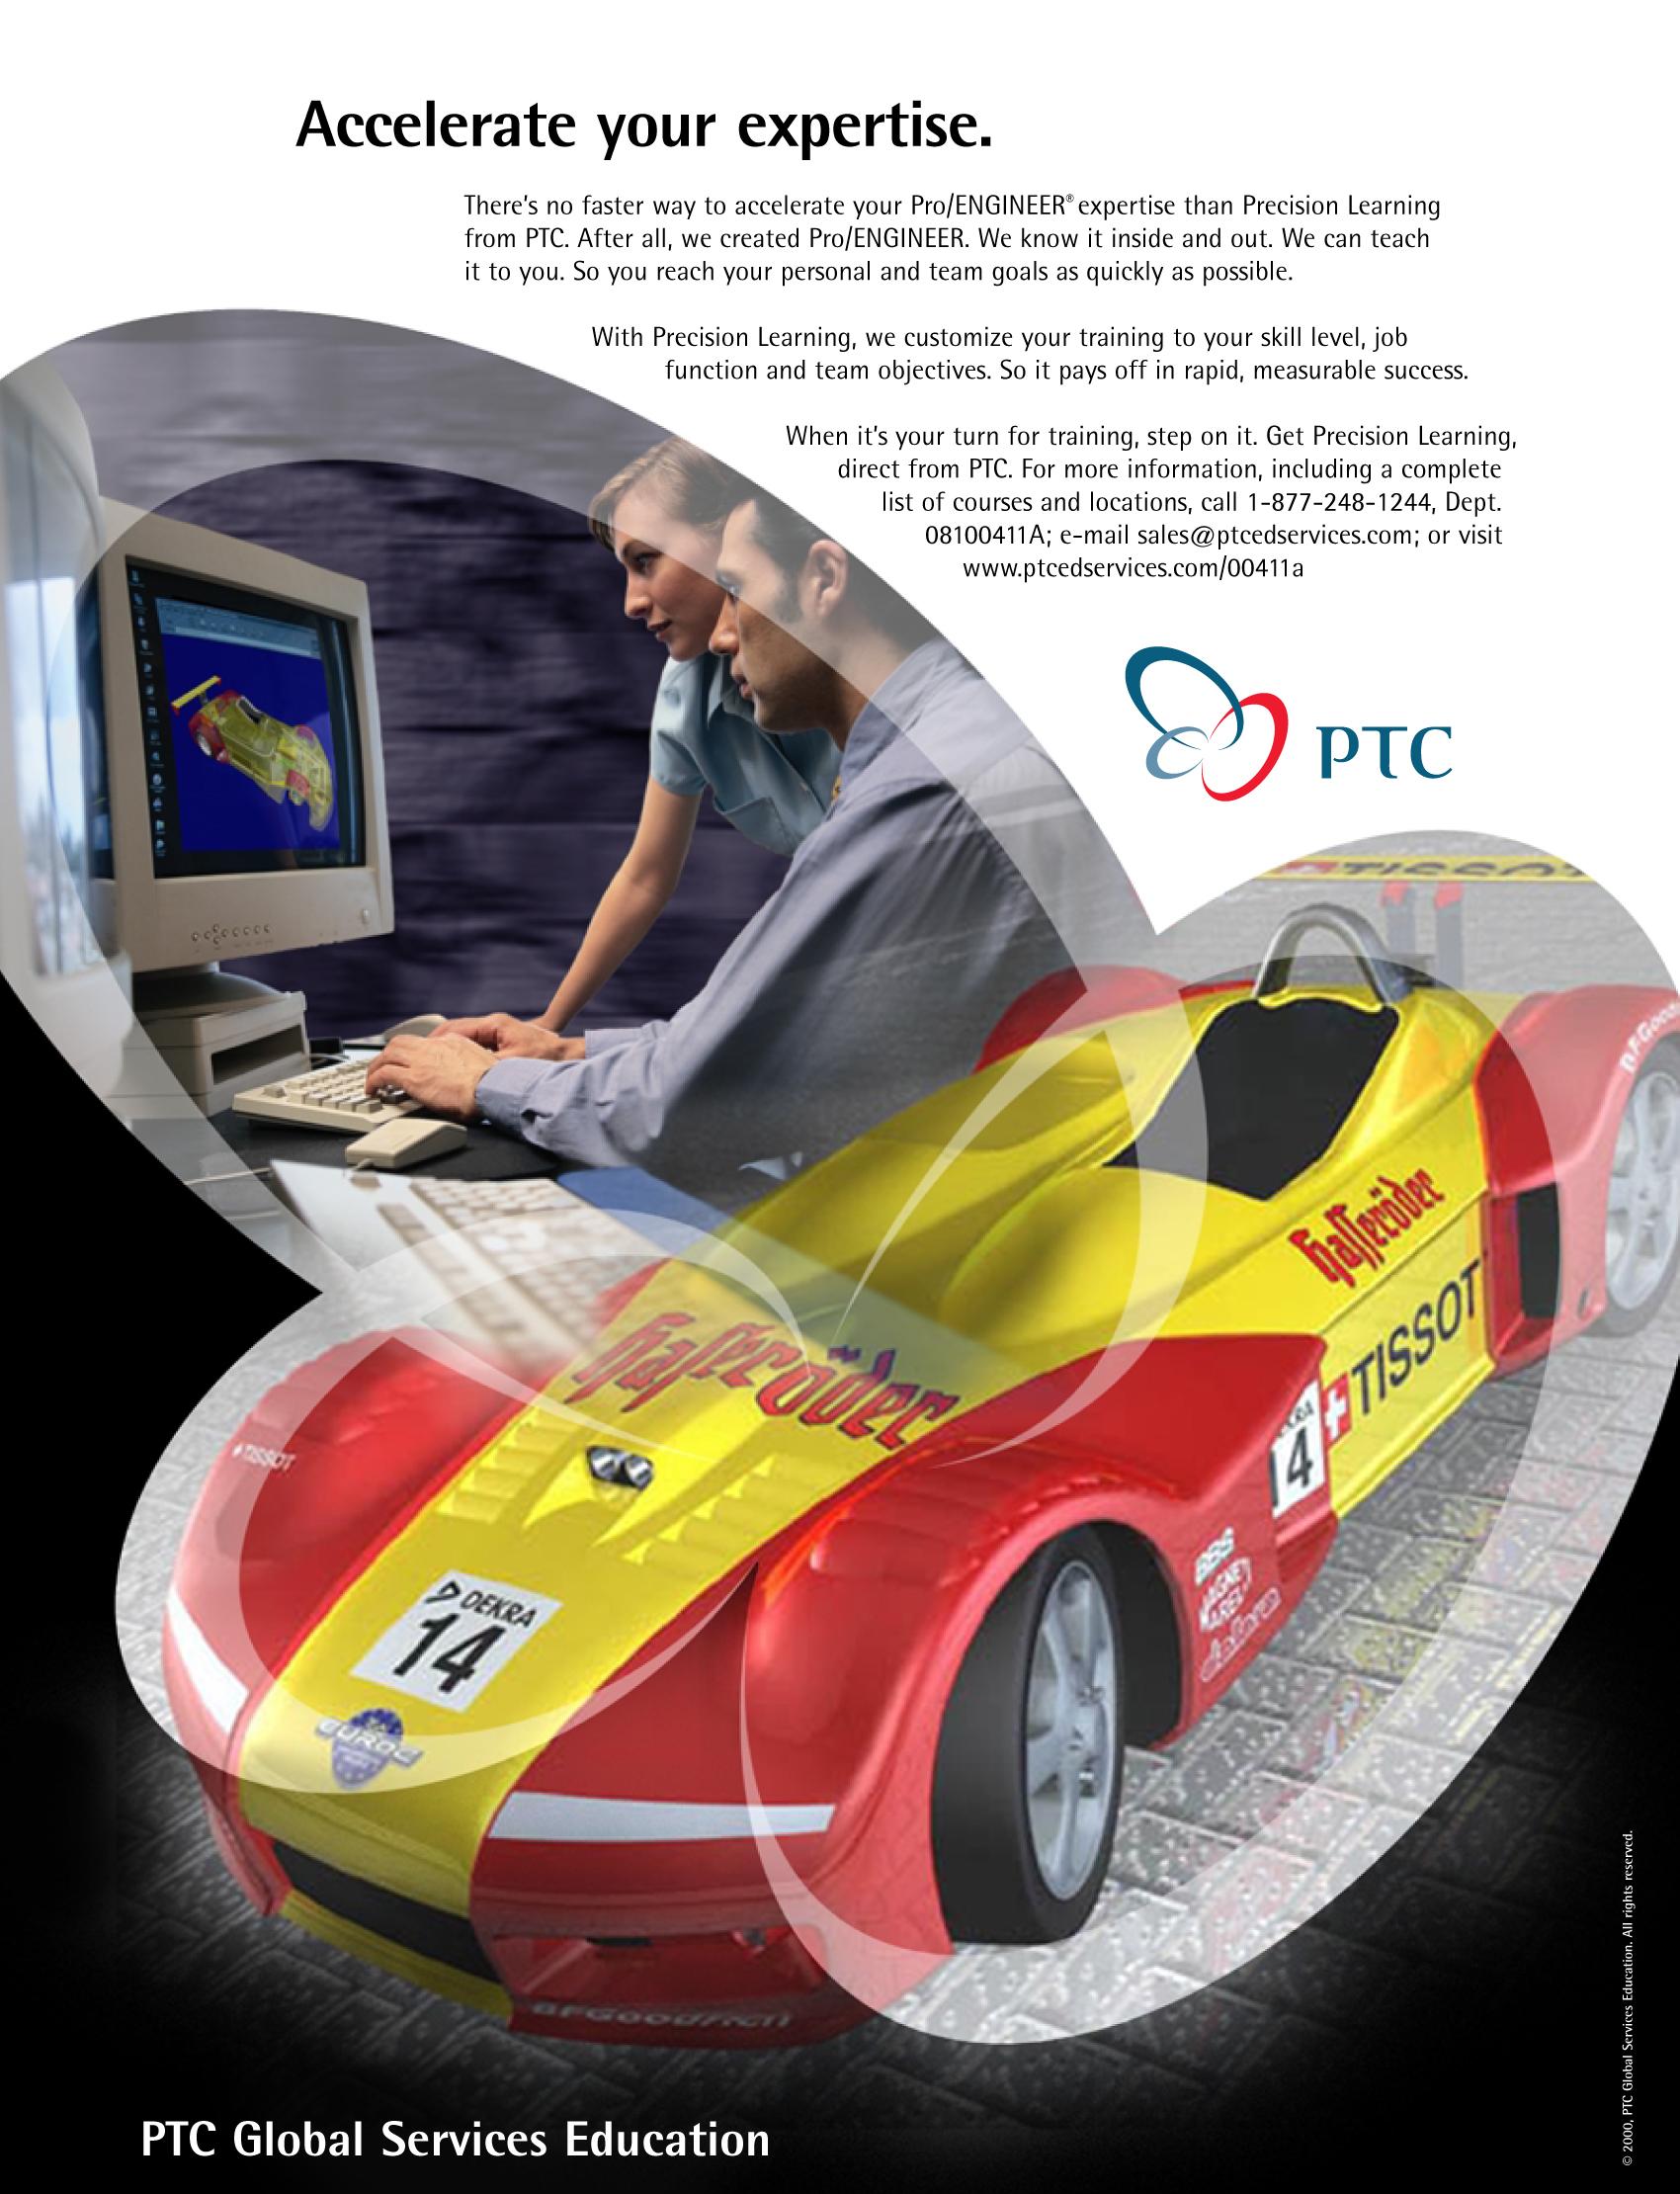 PTC Trade Magazine Ad